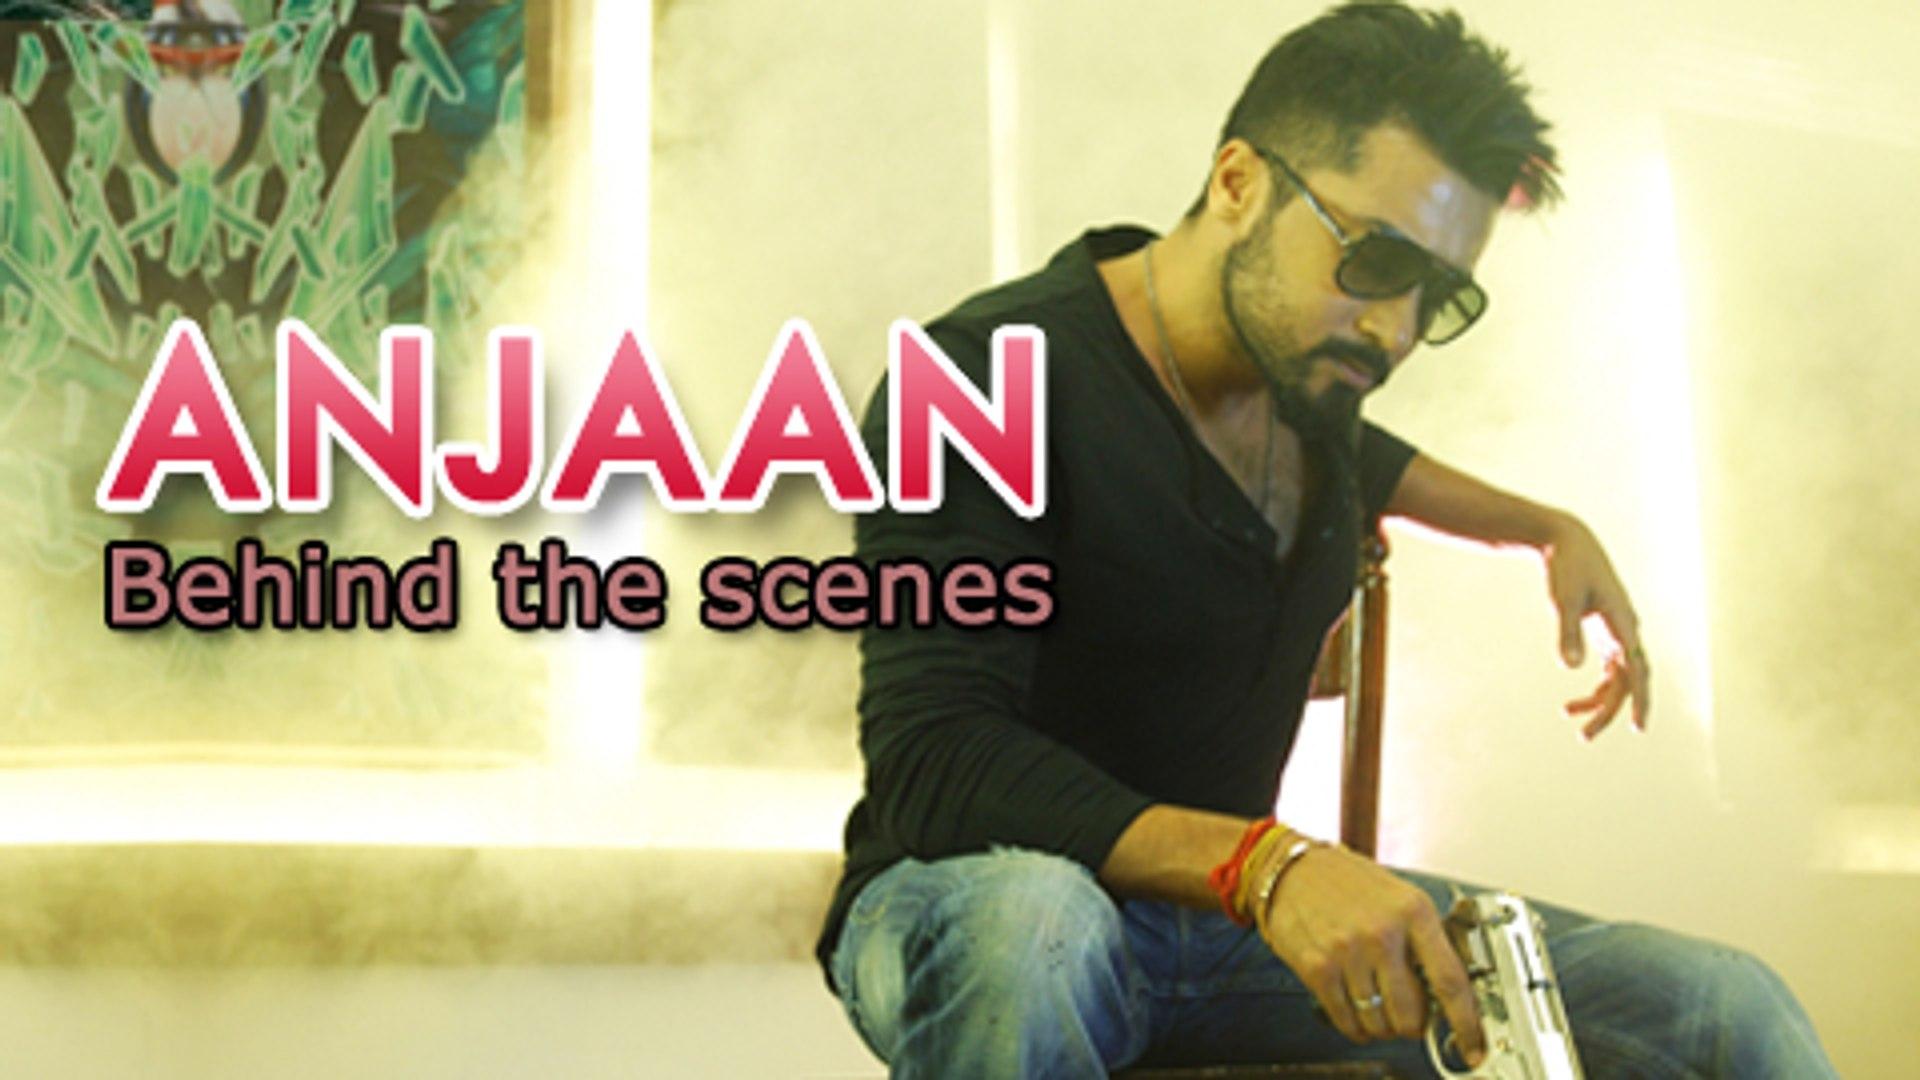 #Anjaan - #Surya, Samantha - Upcoming #Action Thriller Movie - Behind the Scenes